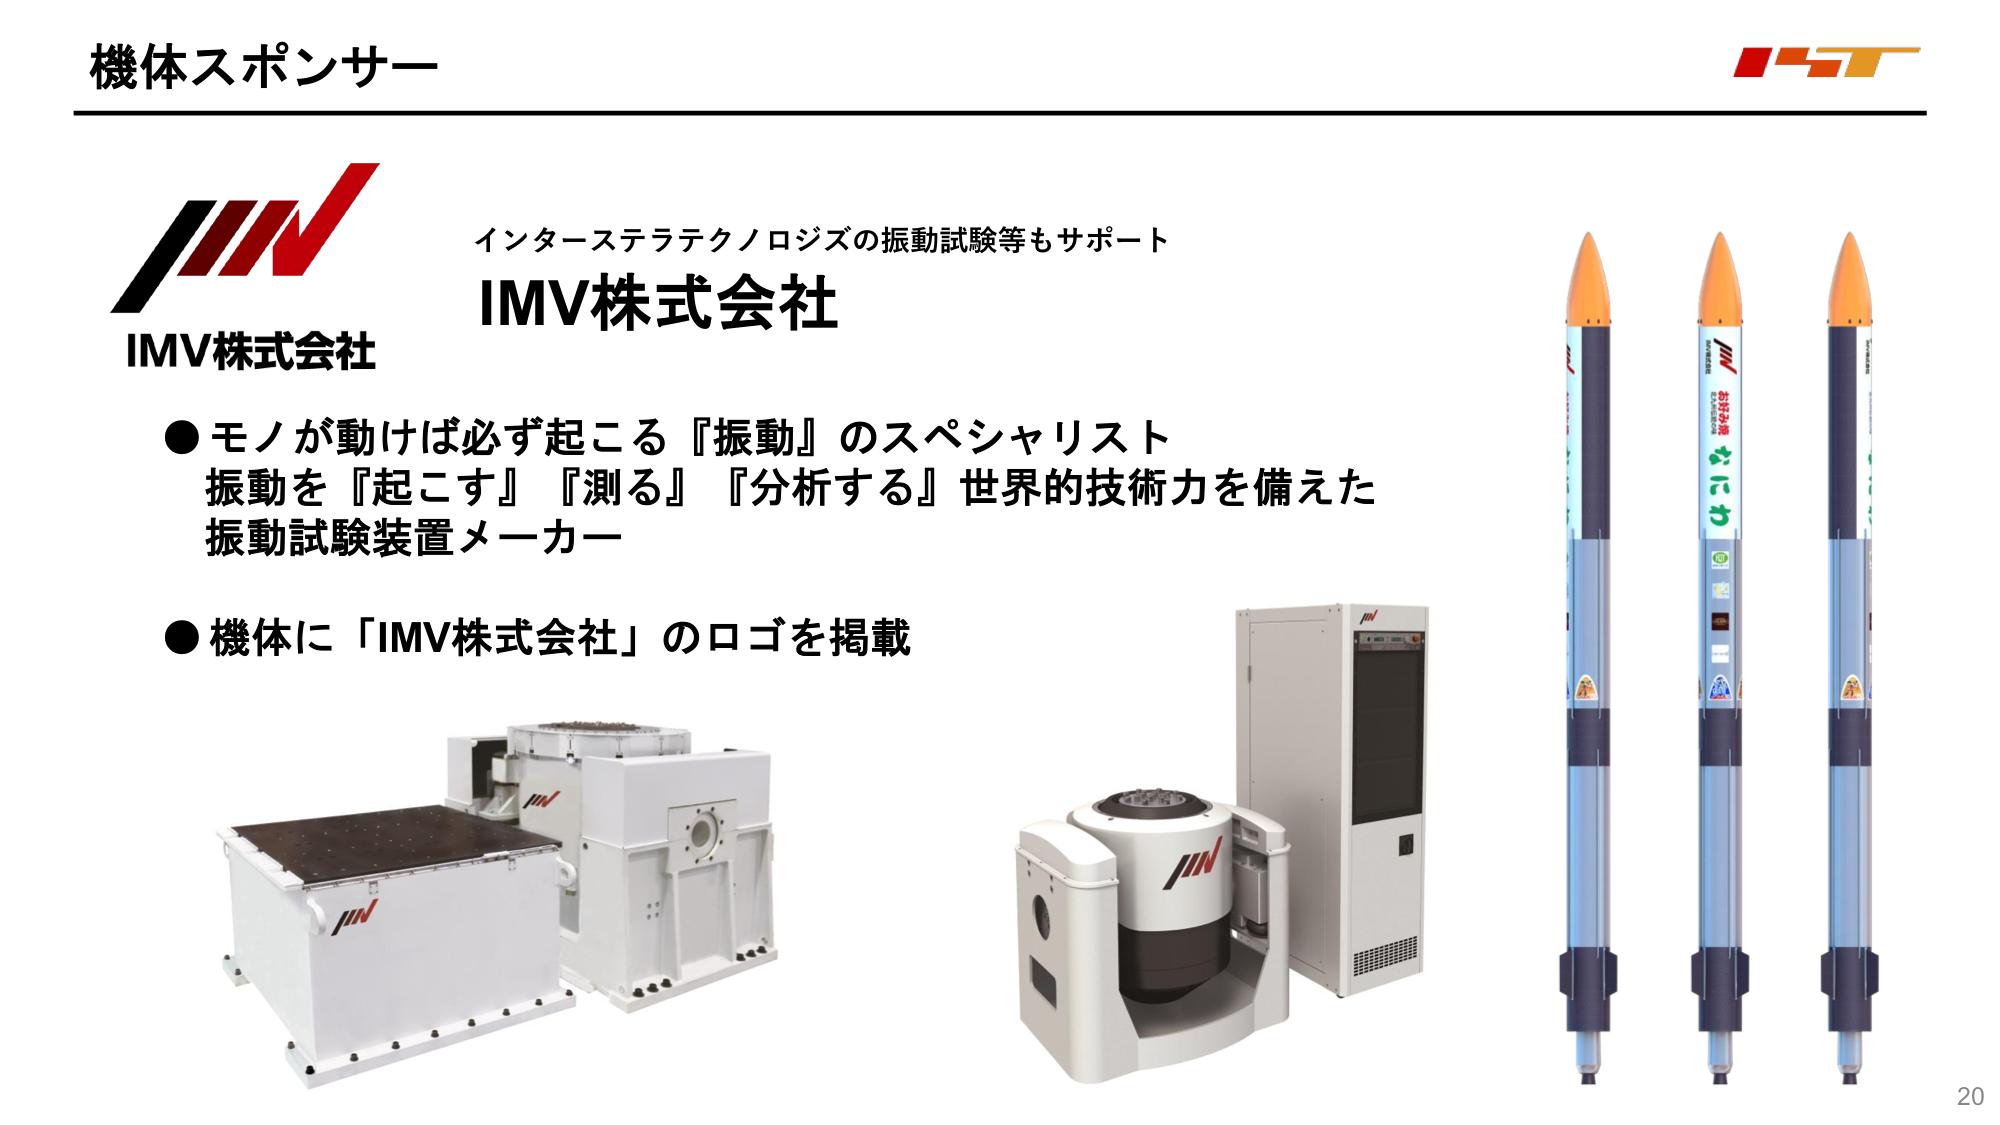 f:id:Imamura:20191126135203p:plain